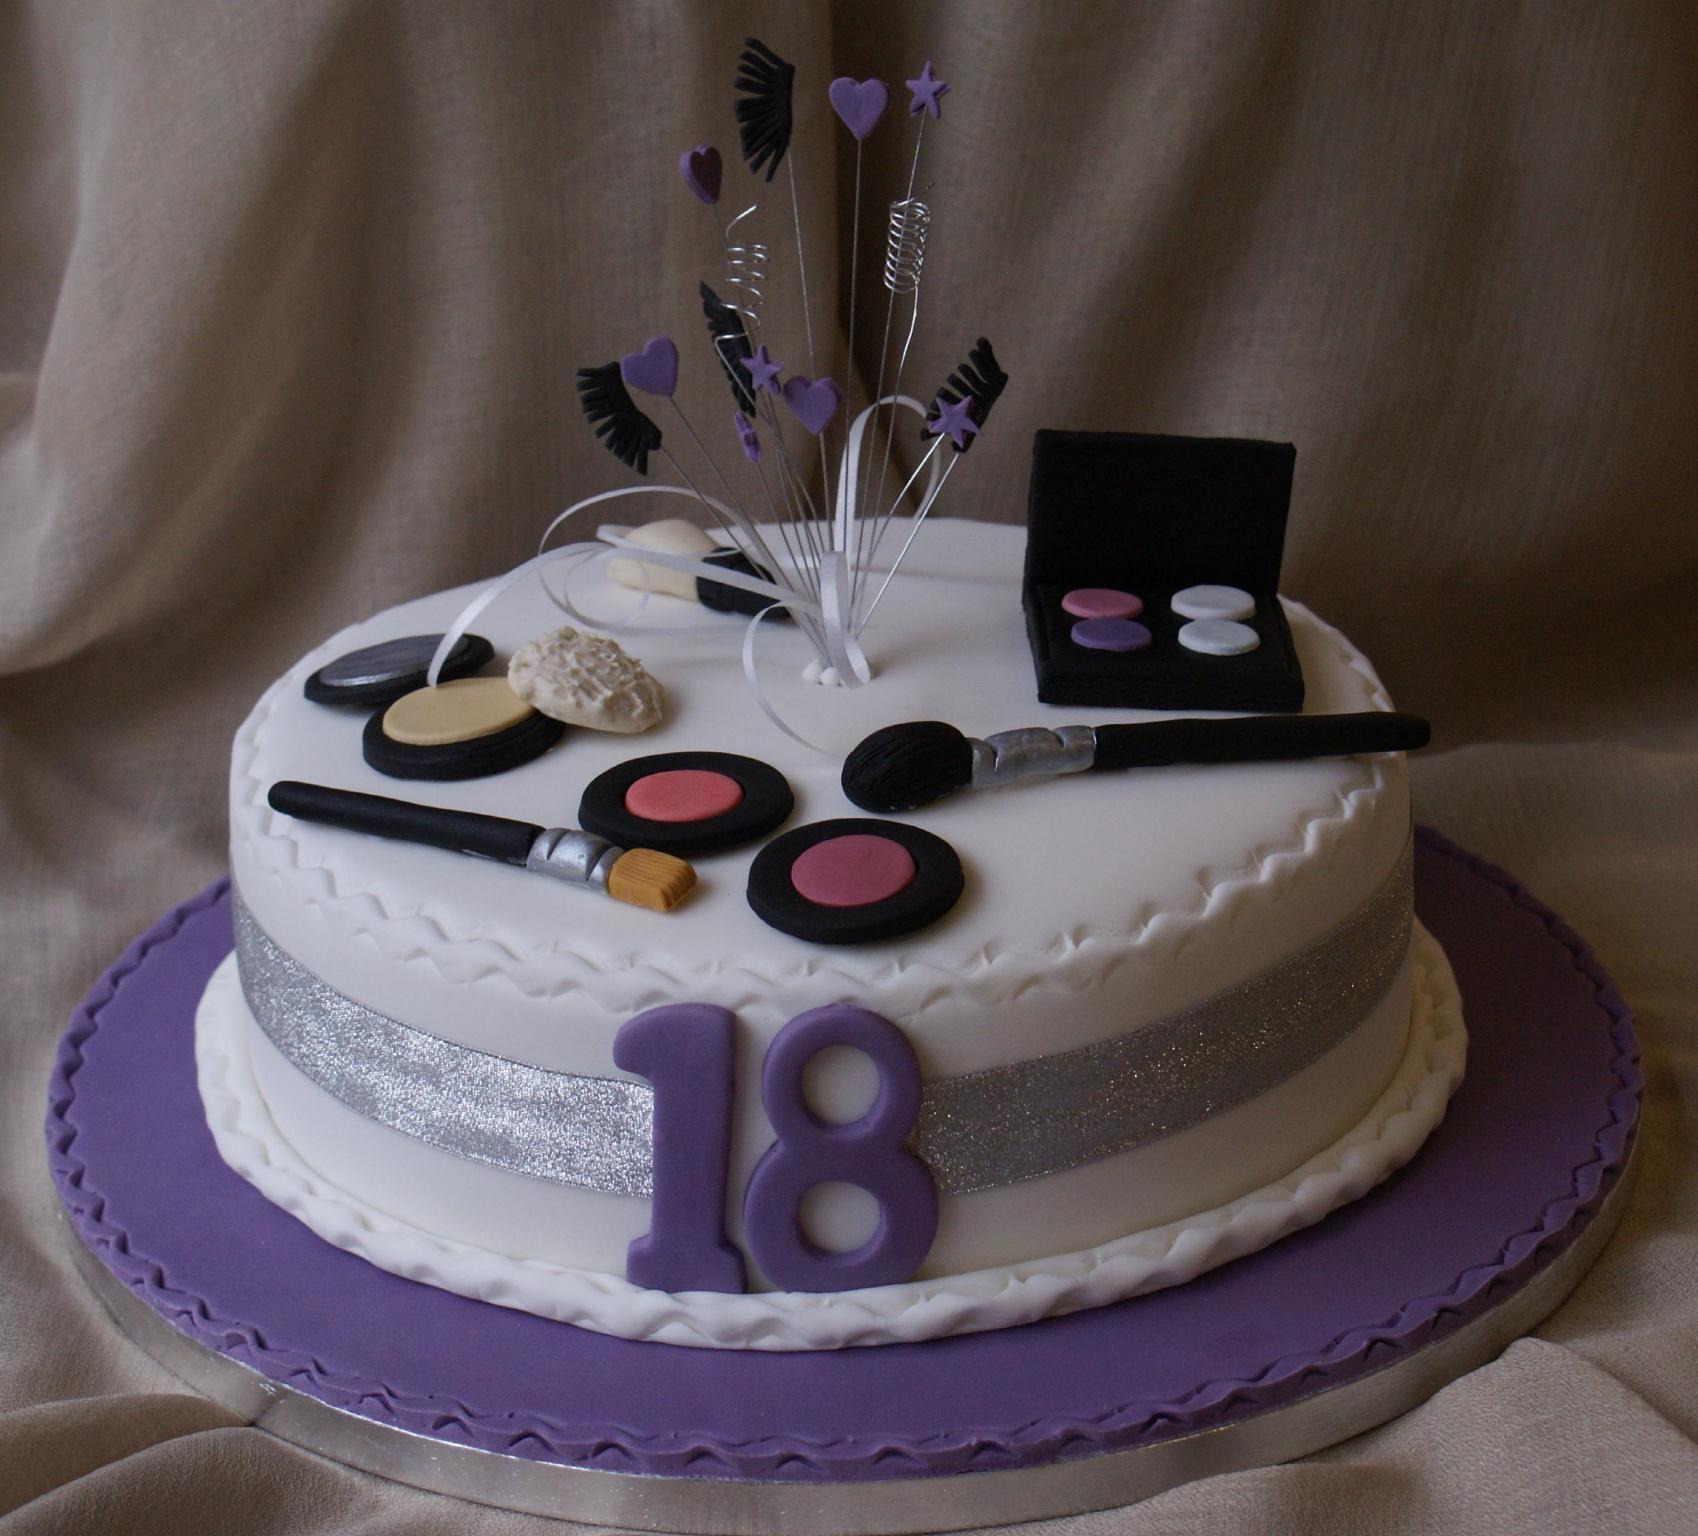 18th Cake - Google Search